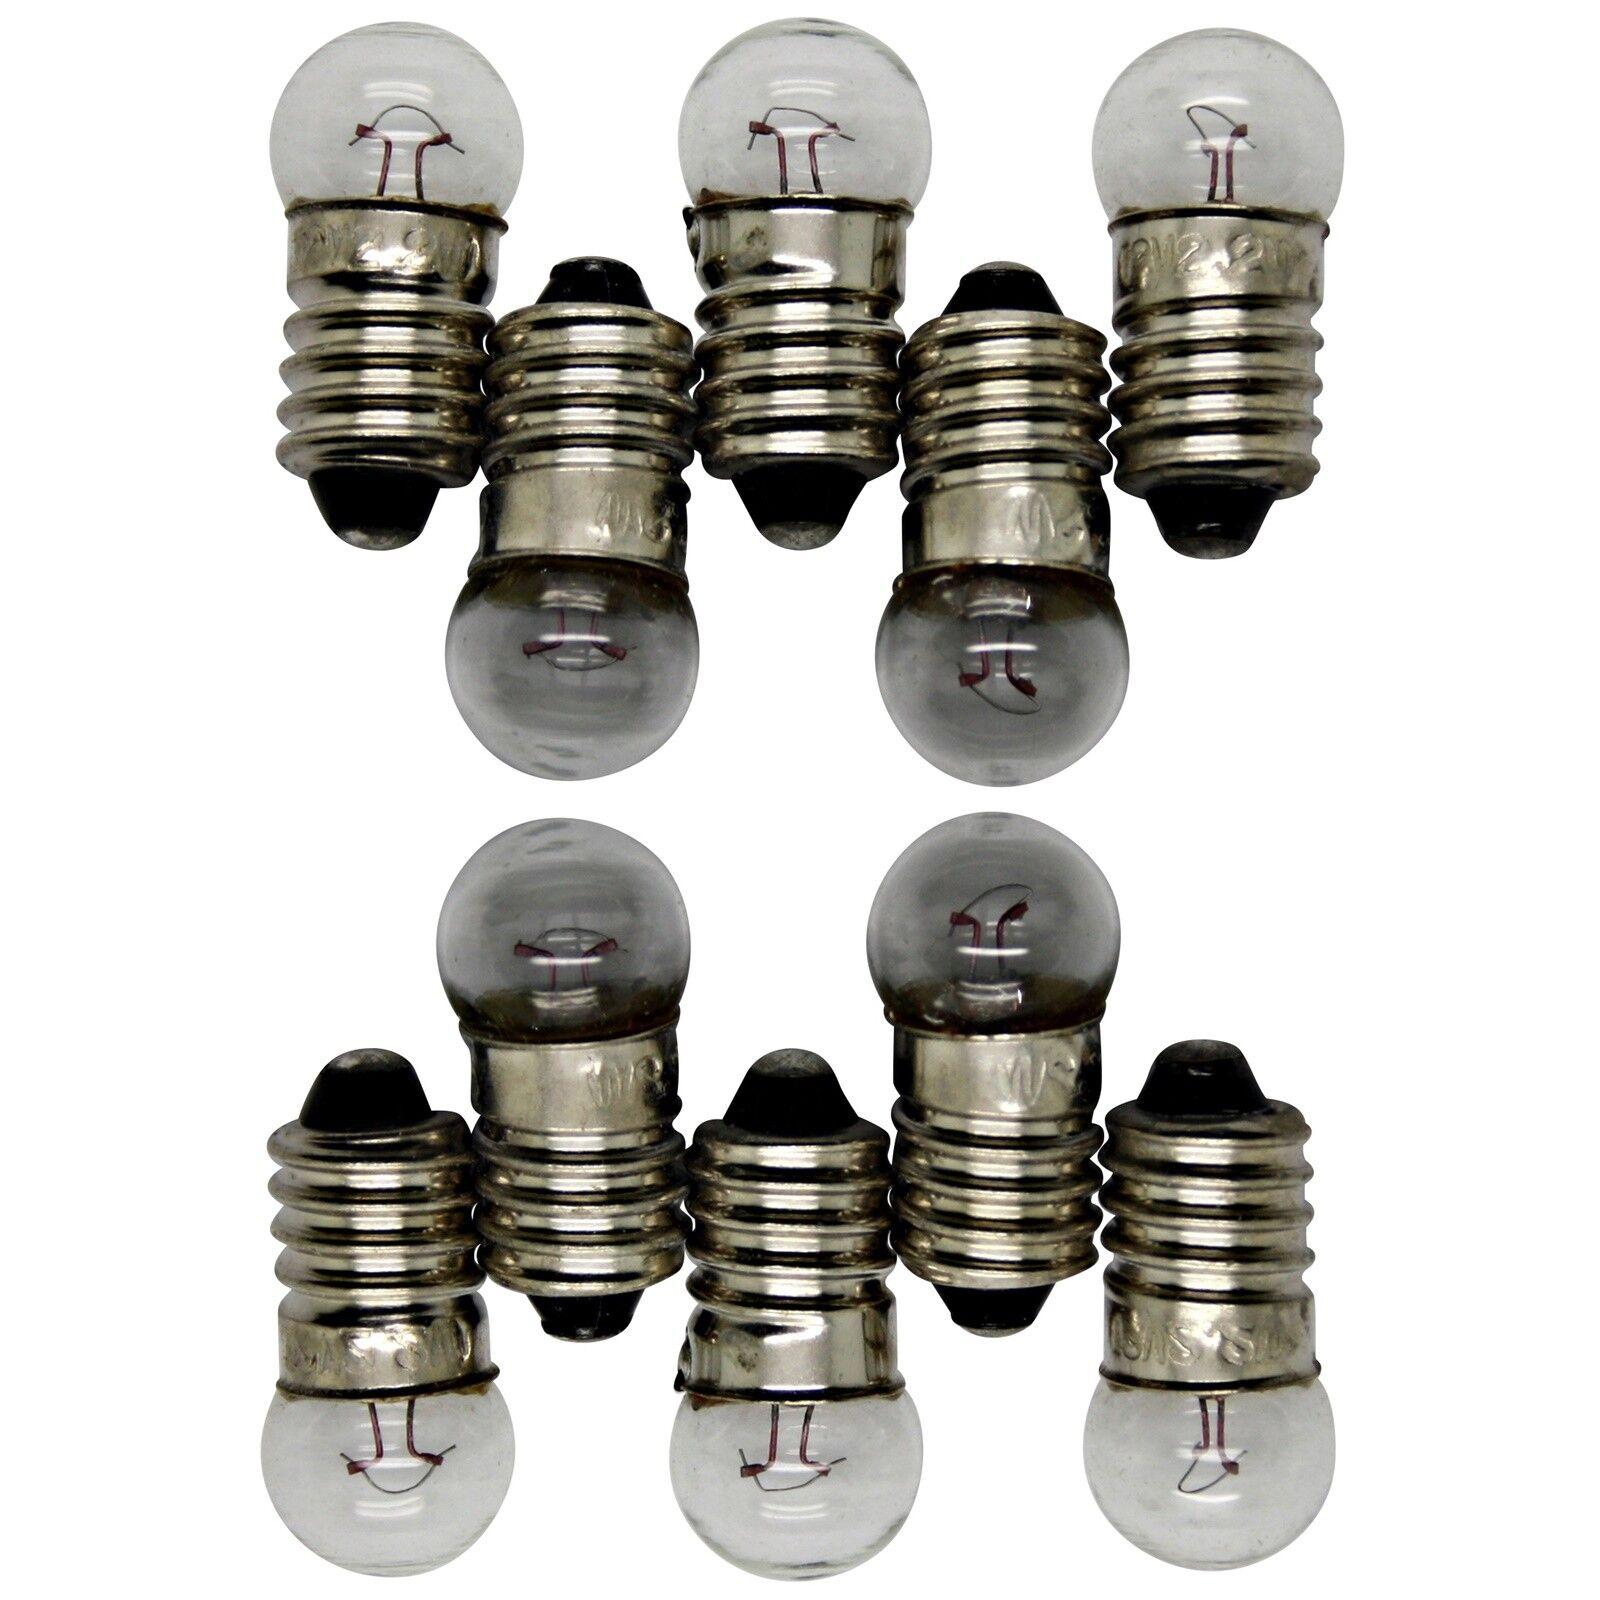 E10 Halogen Bulb Lamp Screw Socket Bulb Flashlight Bulb 12 V